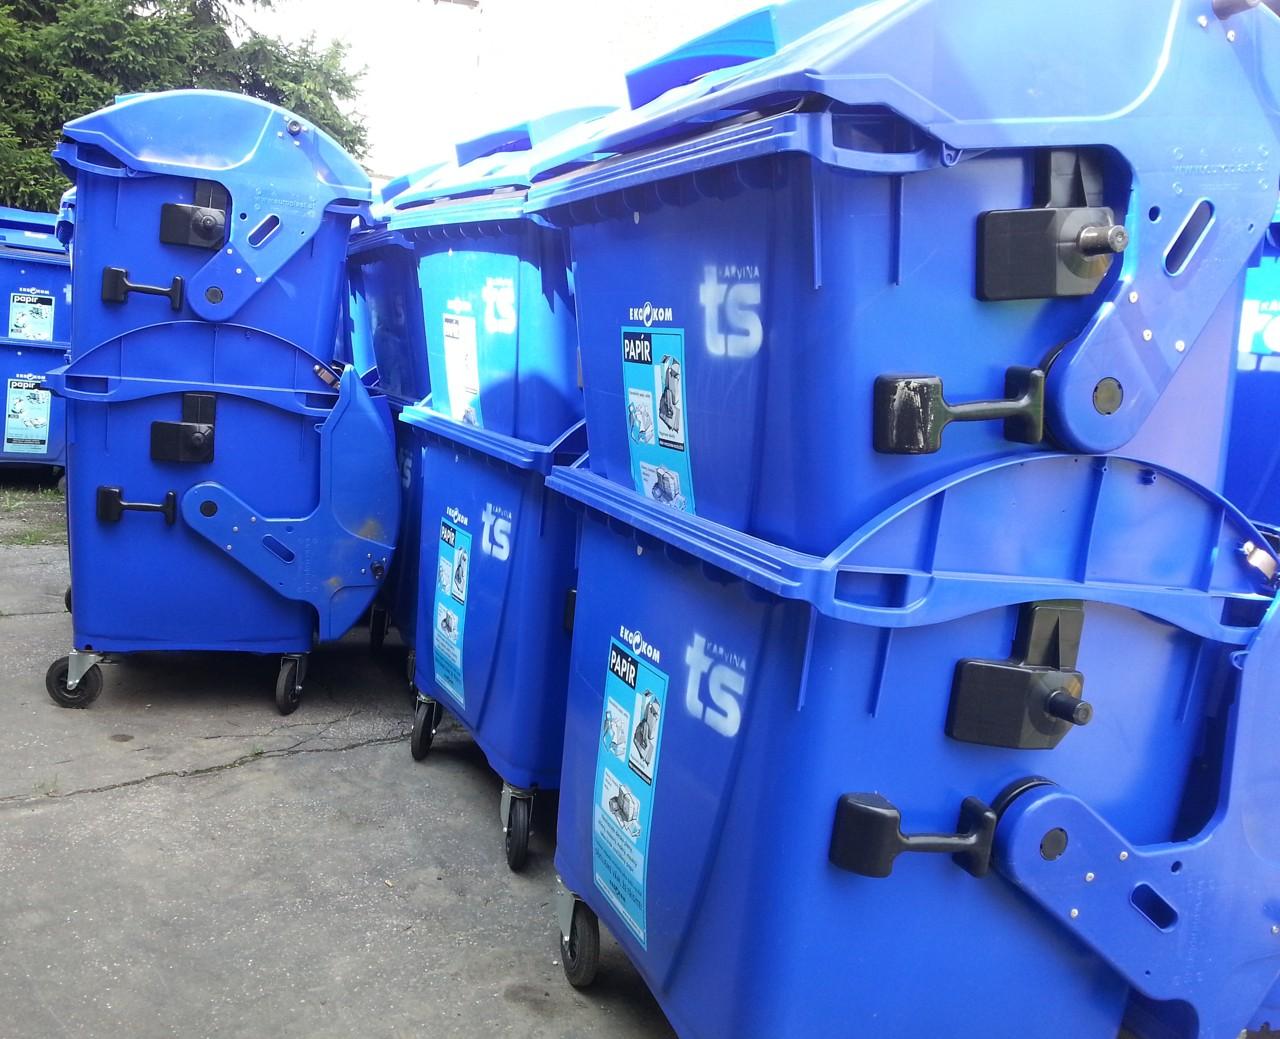 Modré kontejnery na papír